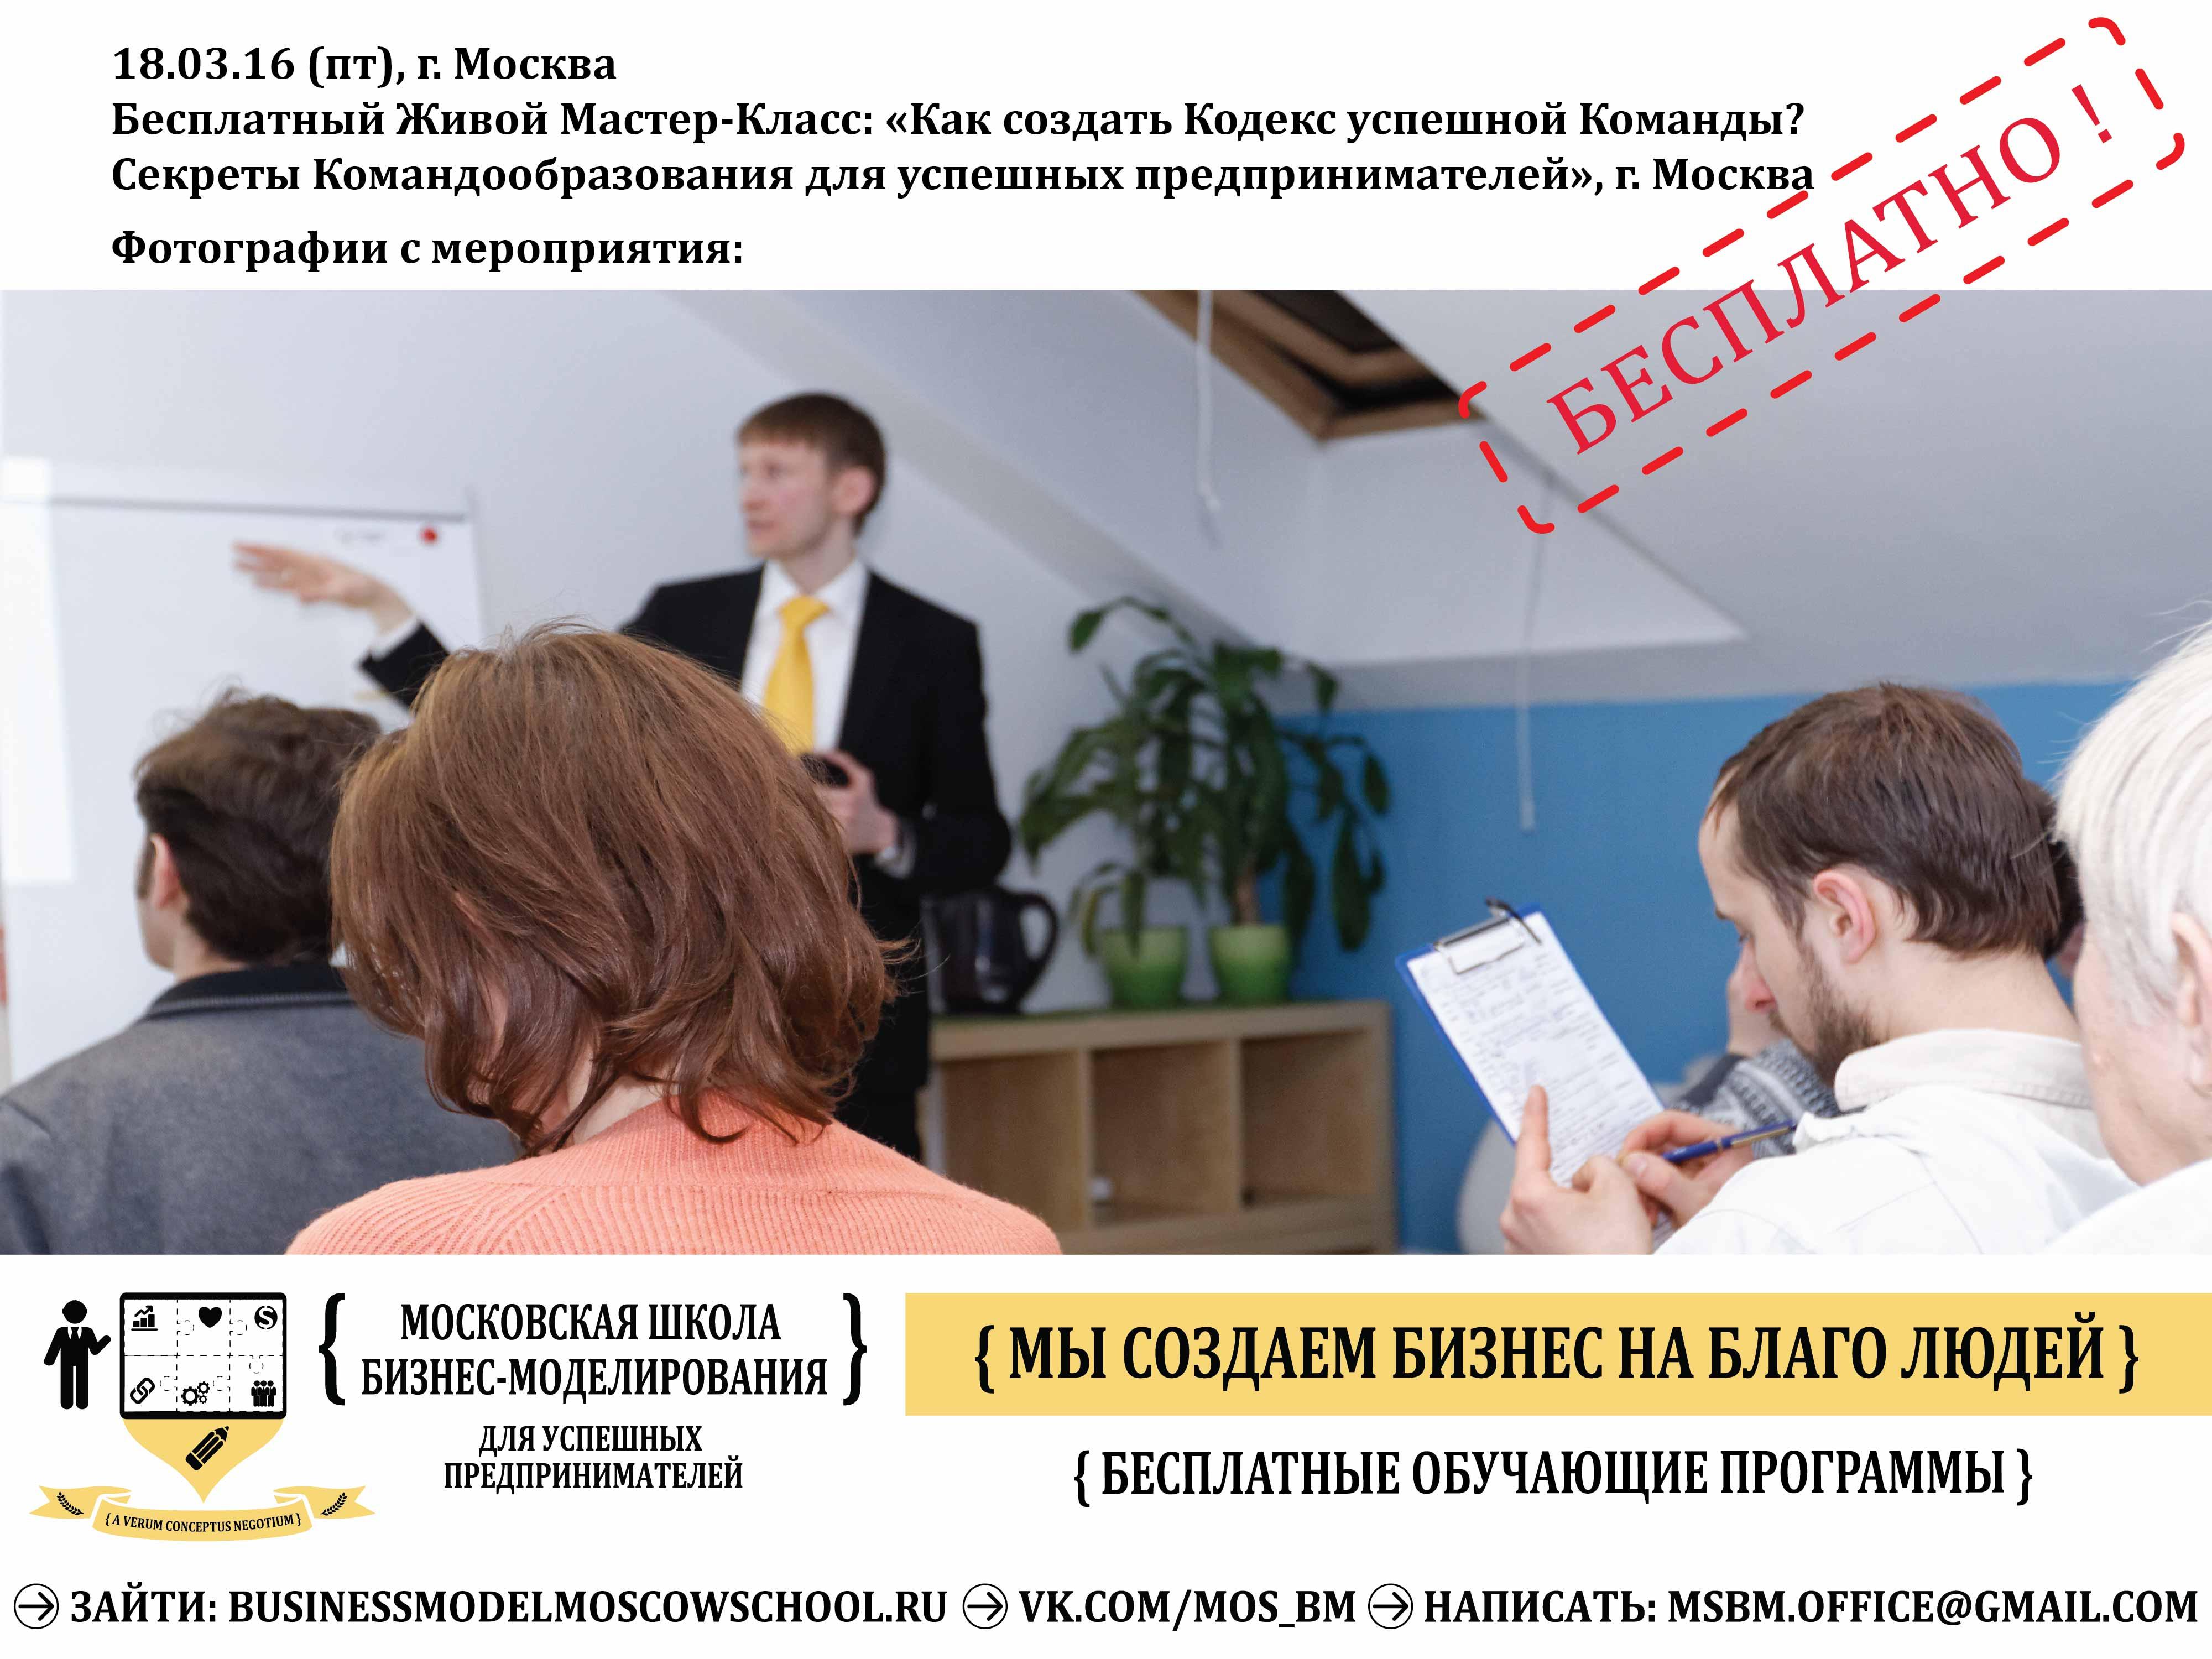 business_model_moscow_school_mclass_photo-18.03.16-3